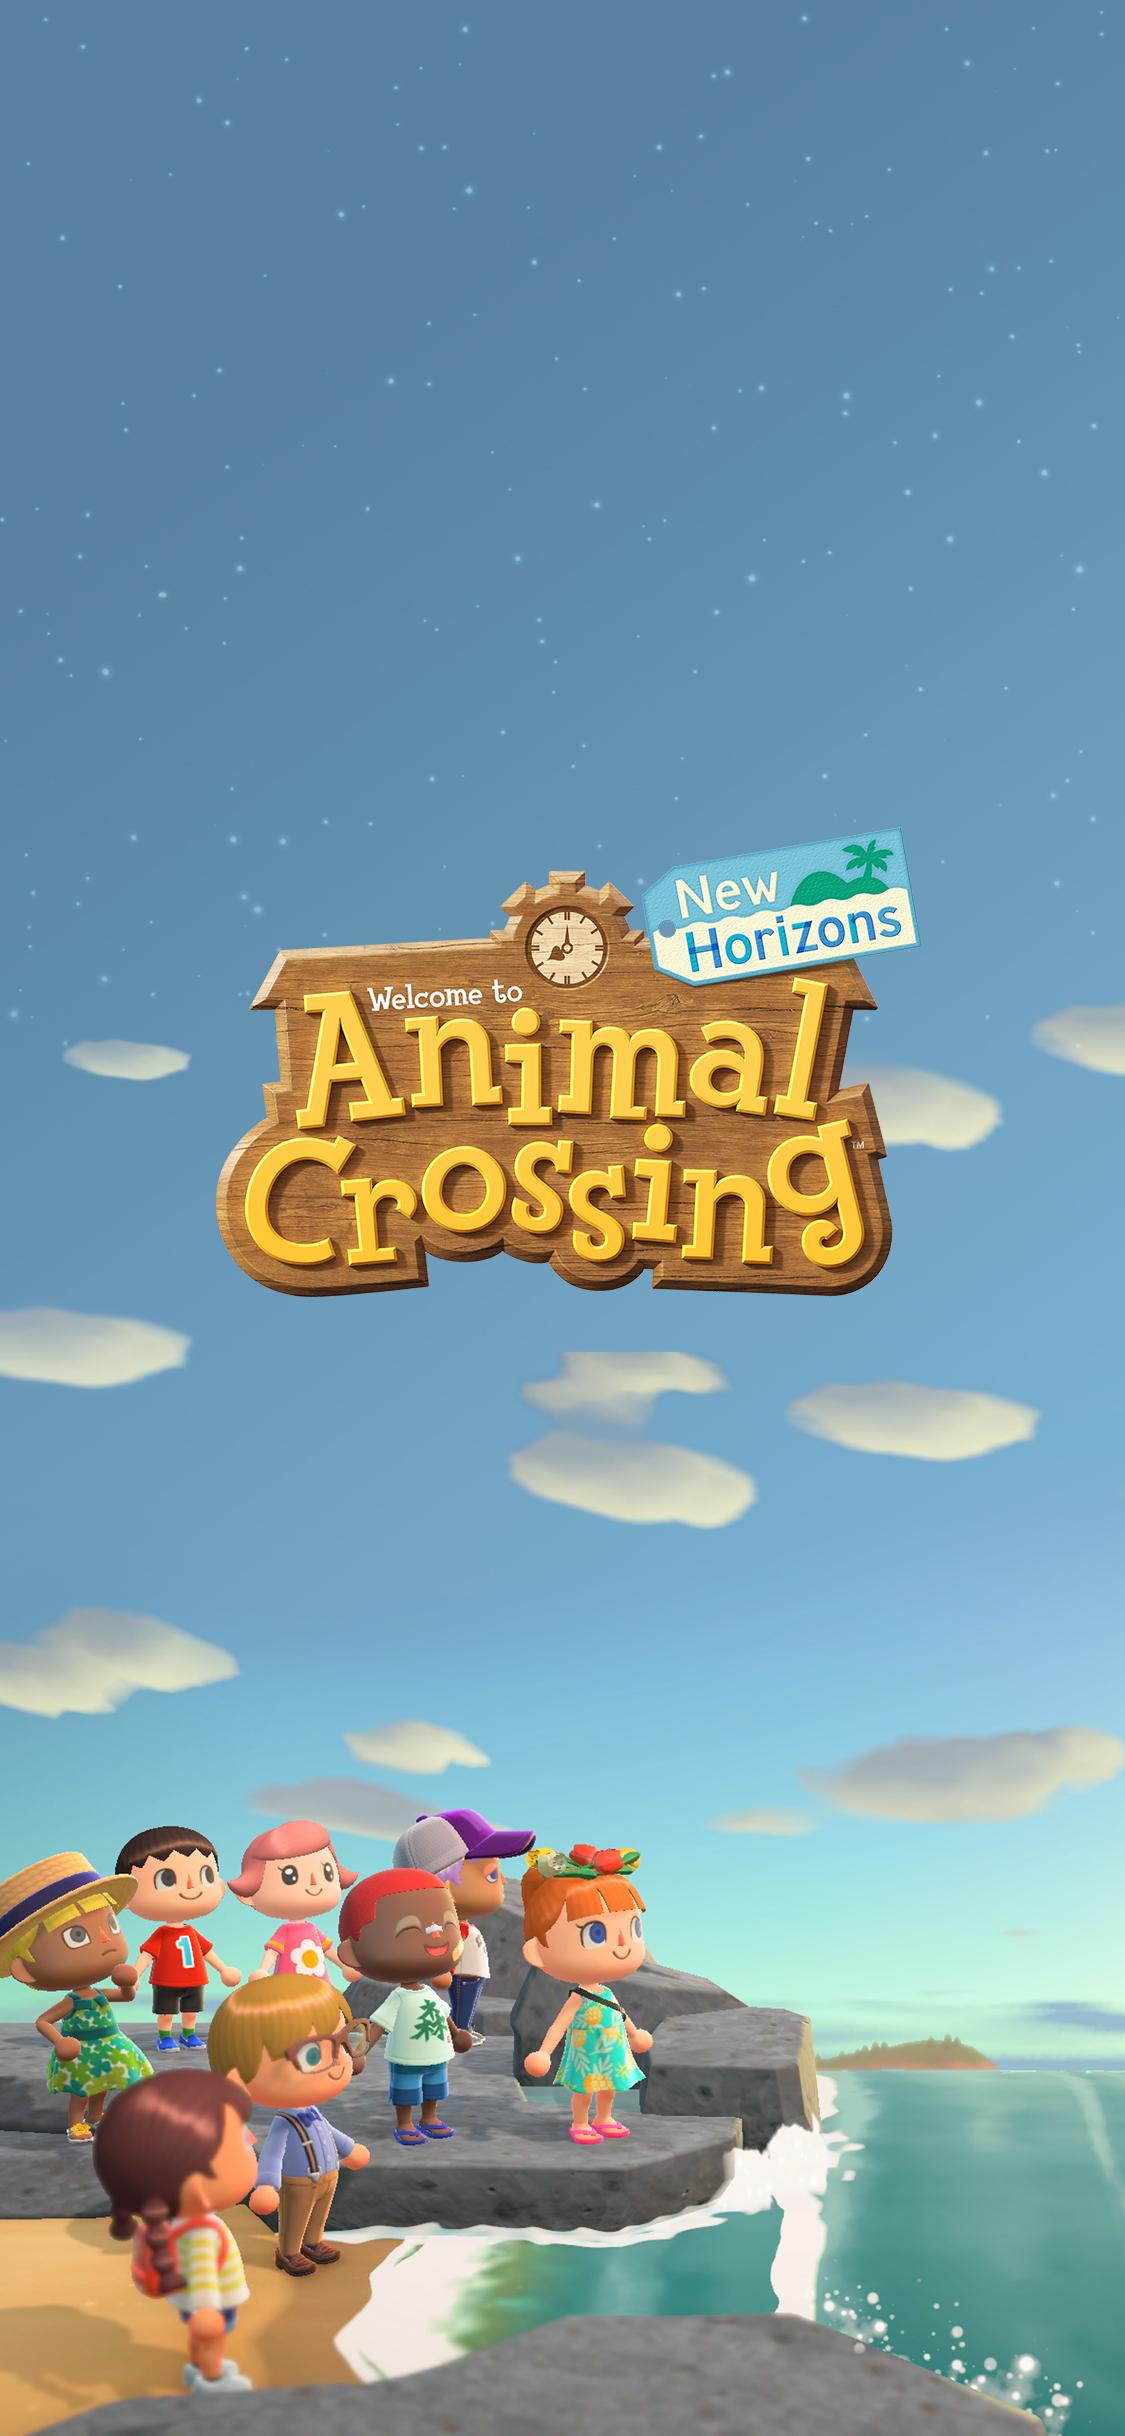 Running Wallpaper Iphone Animal Crossing New Horizons Shoreline Wallpaper Cat